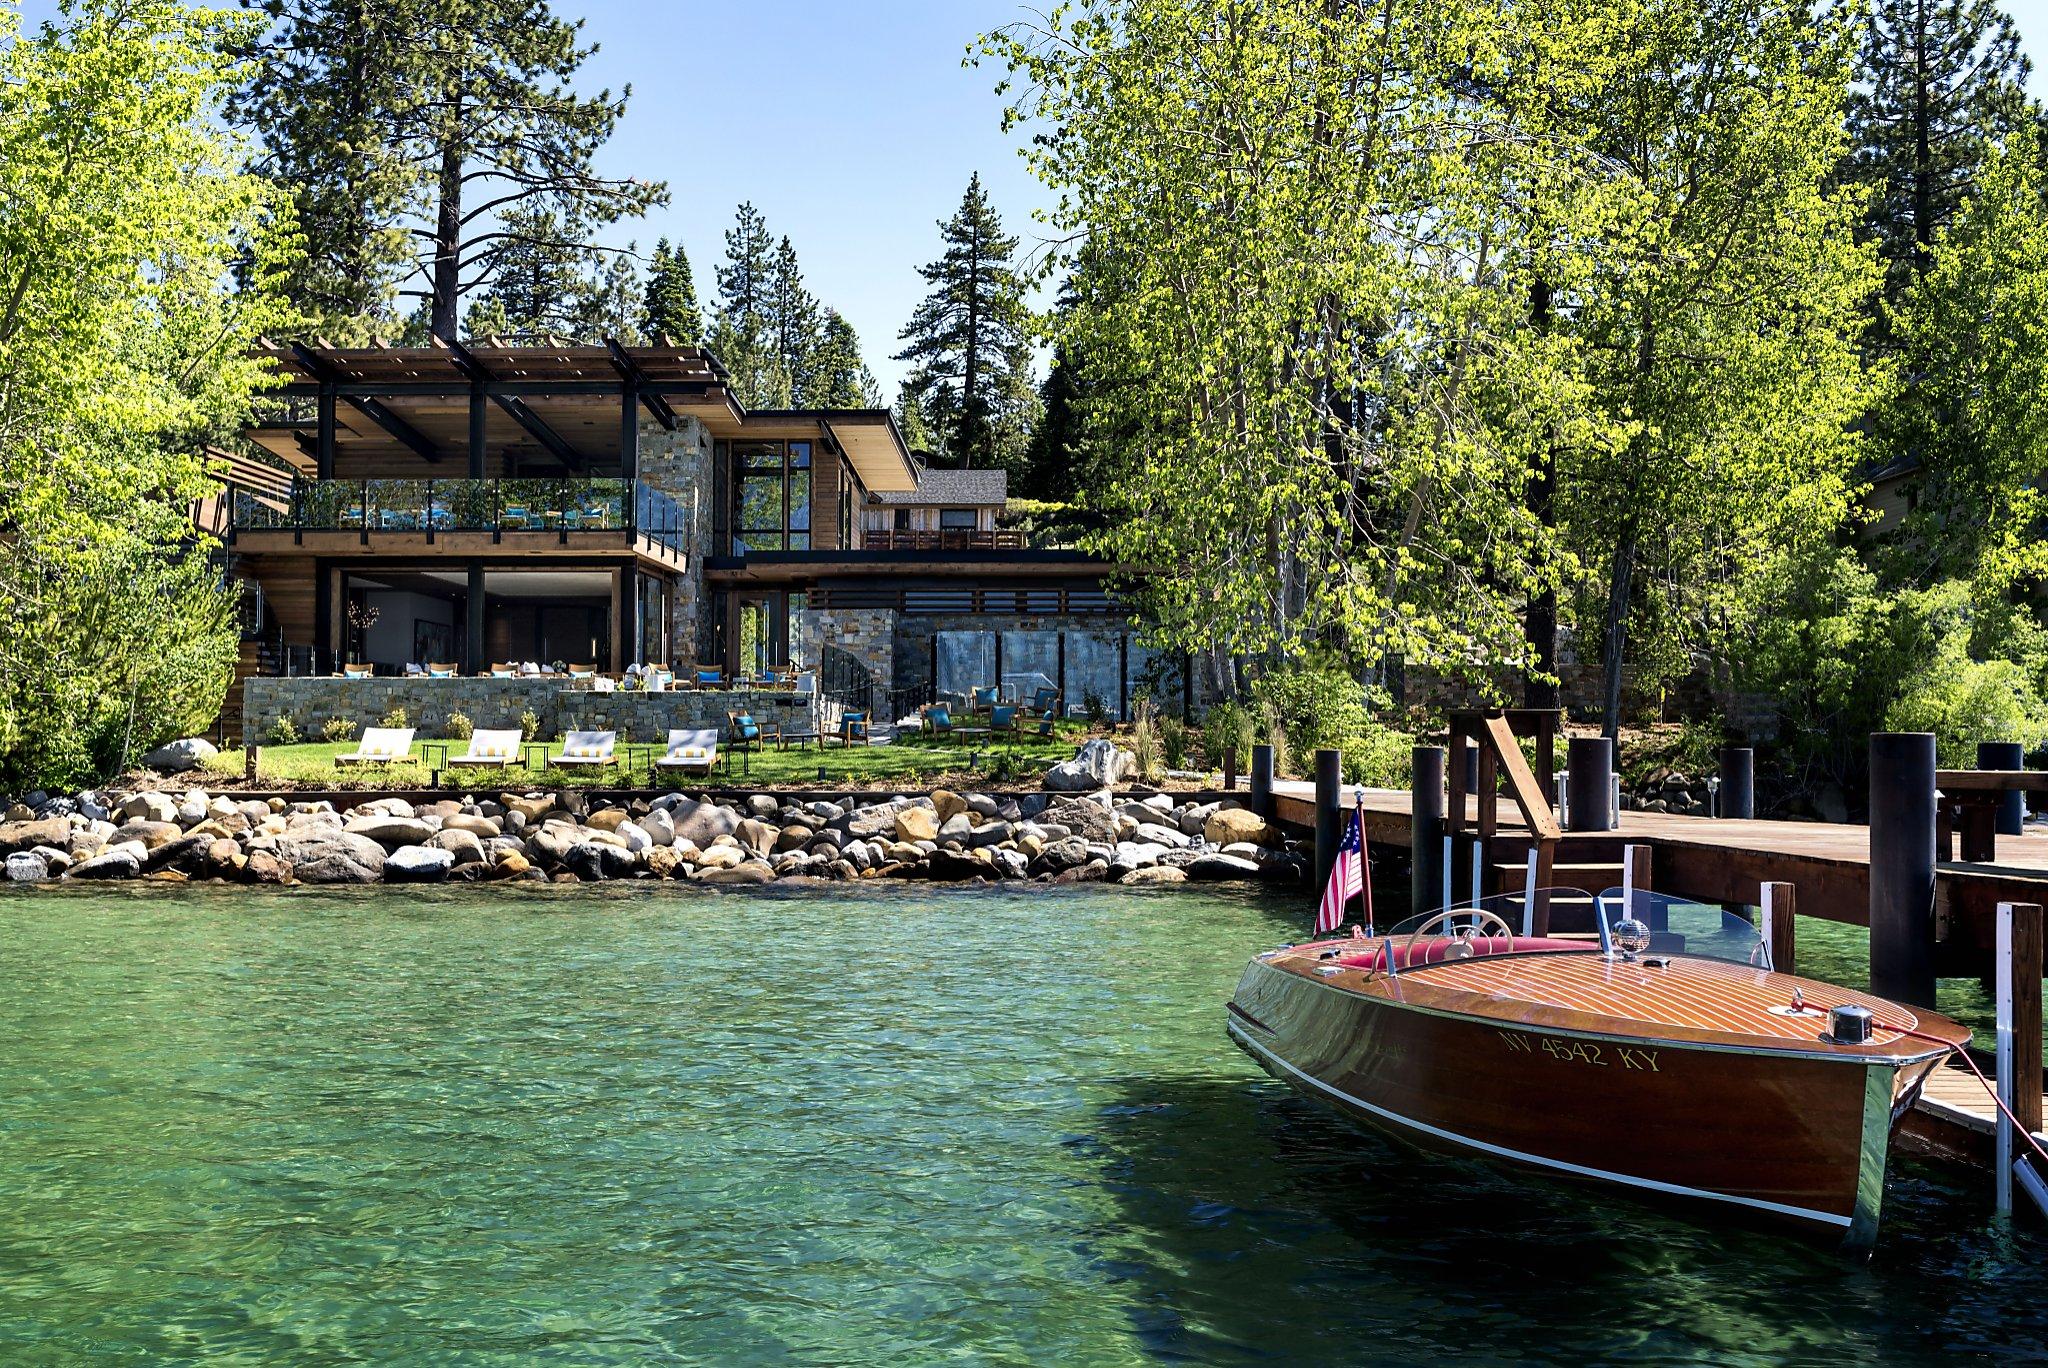 Incall Escorts South Lake Tahoe And Independant Escorts In South Lake Tahoe Ca